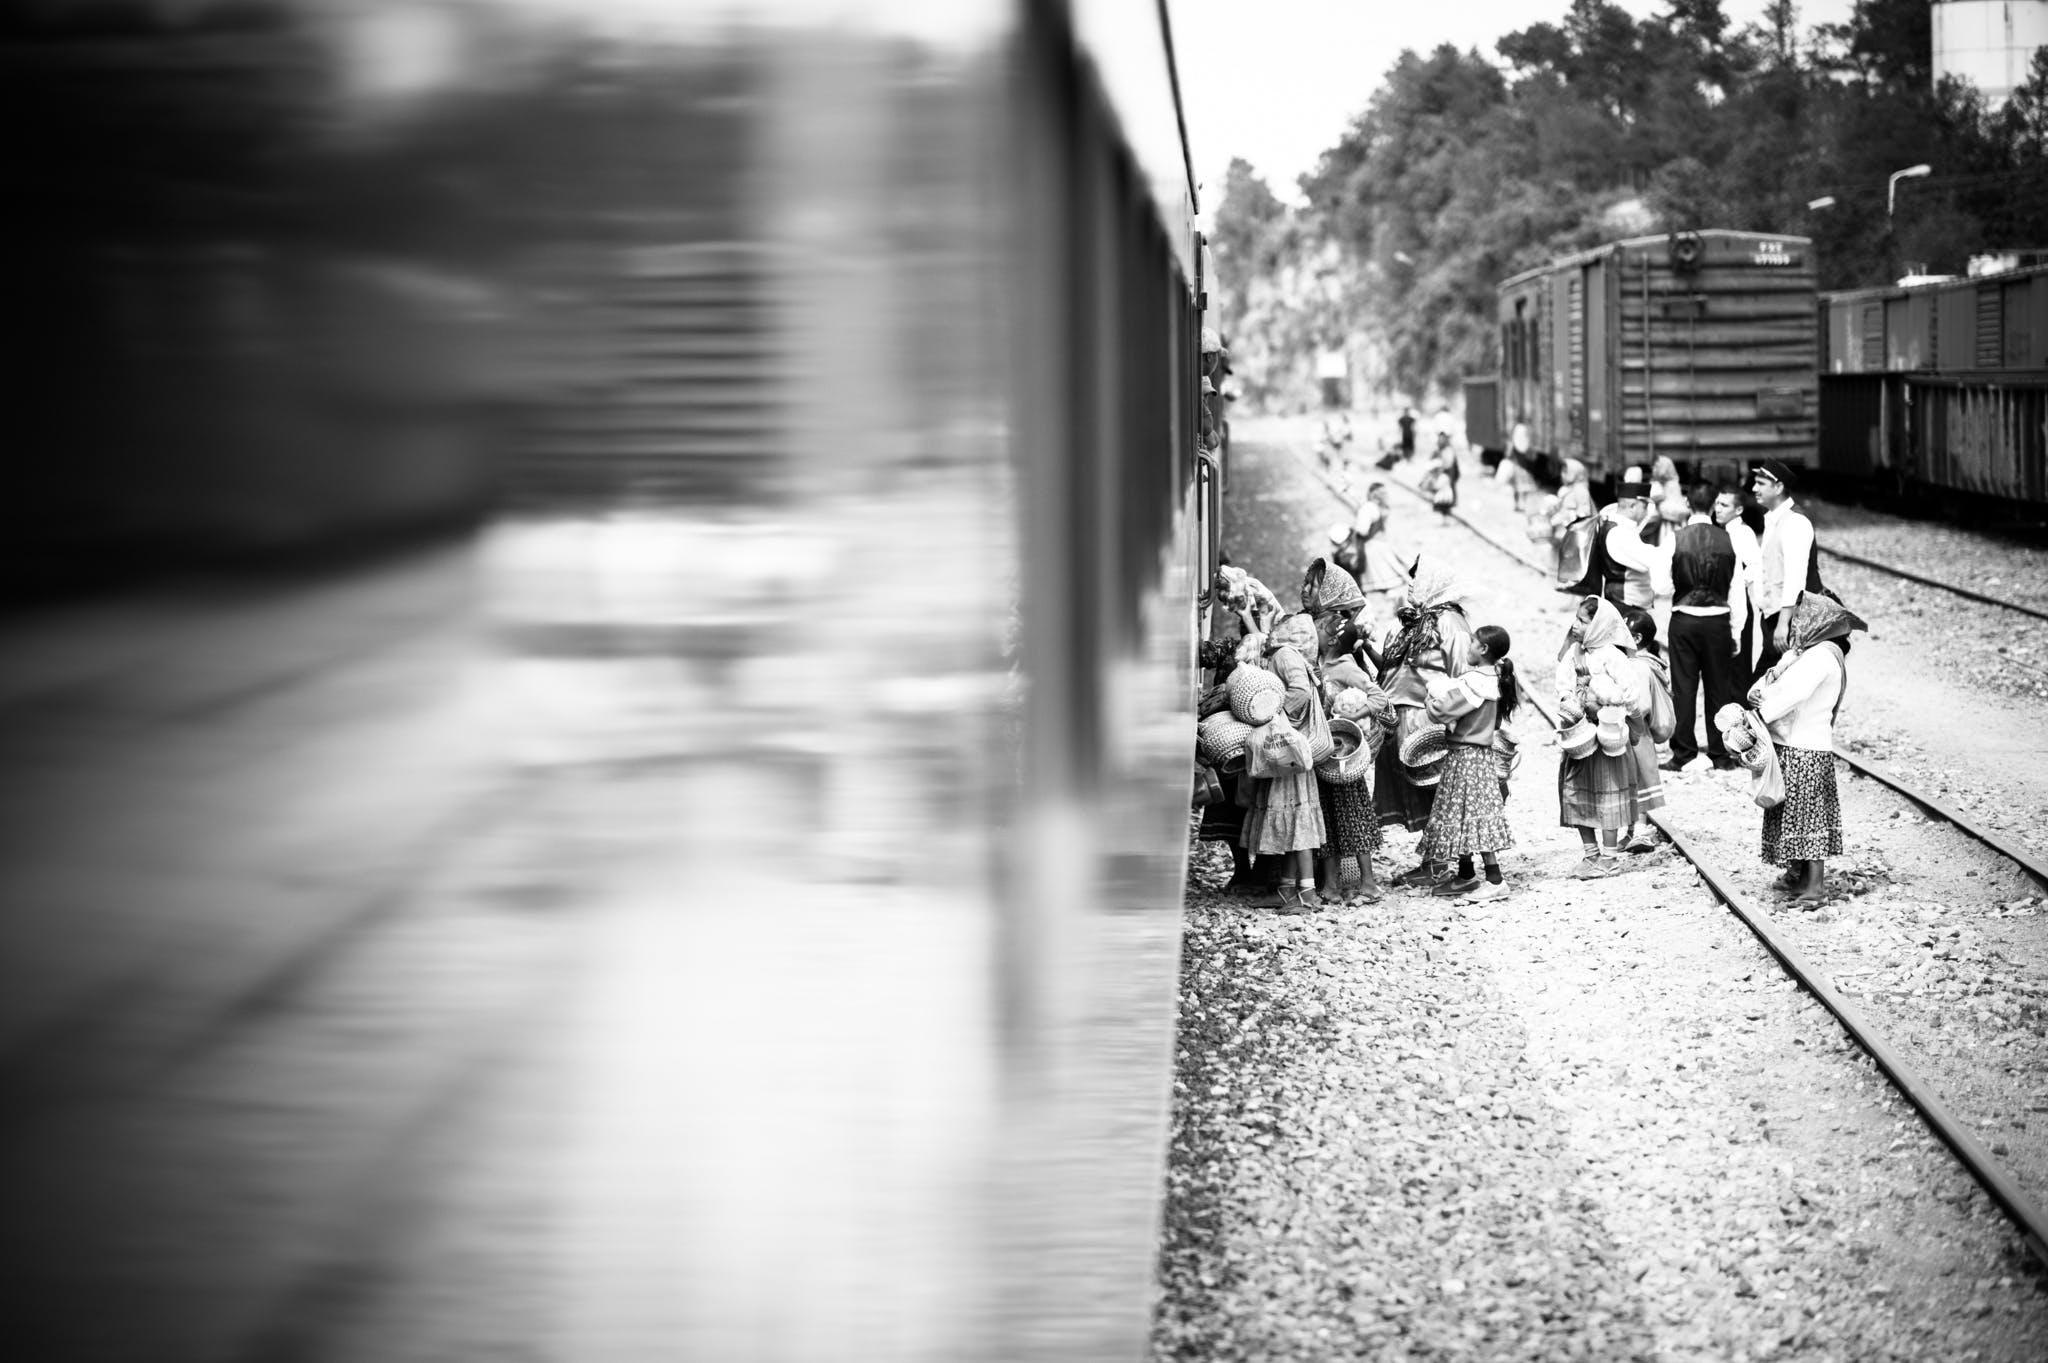 People Boarding The Train